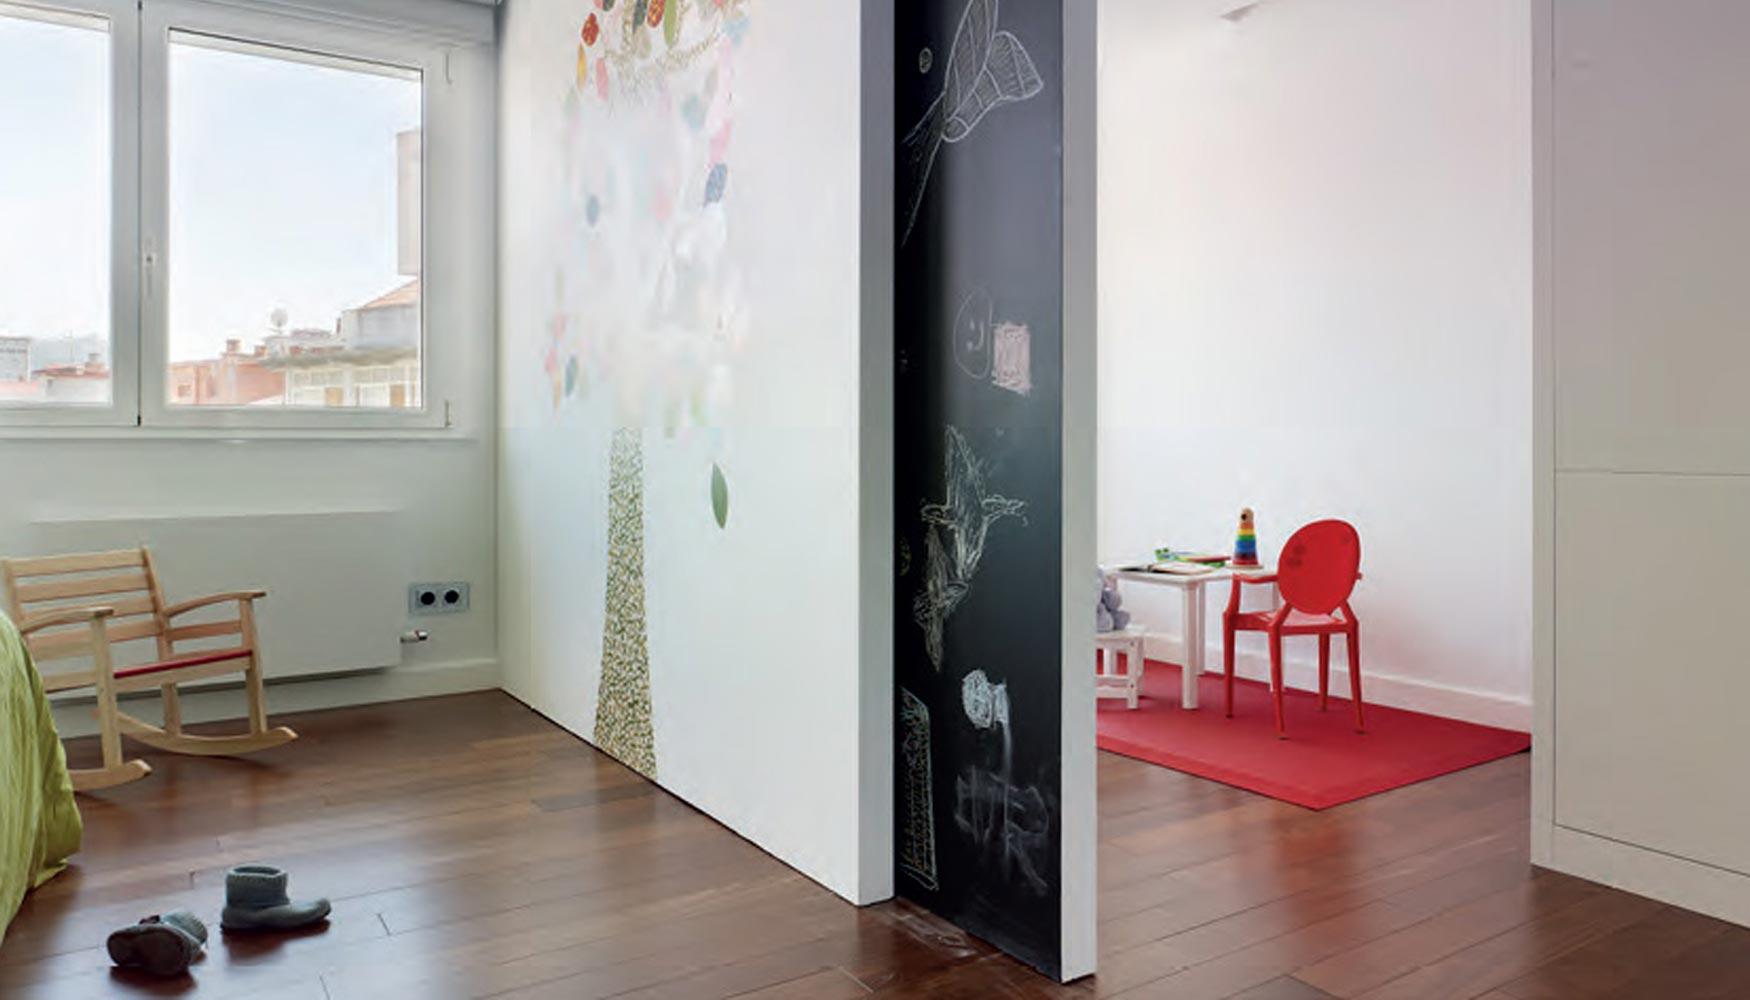 Klein transforma espacios oscuros en luminosos gracias a sus paneles m viles construcci n - Tabiques de cristal para viviendas ...